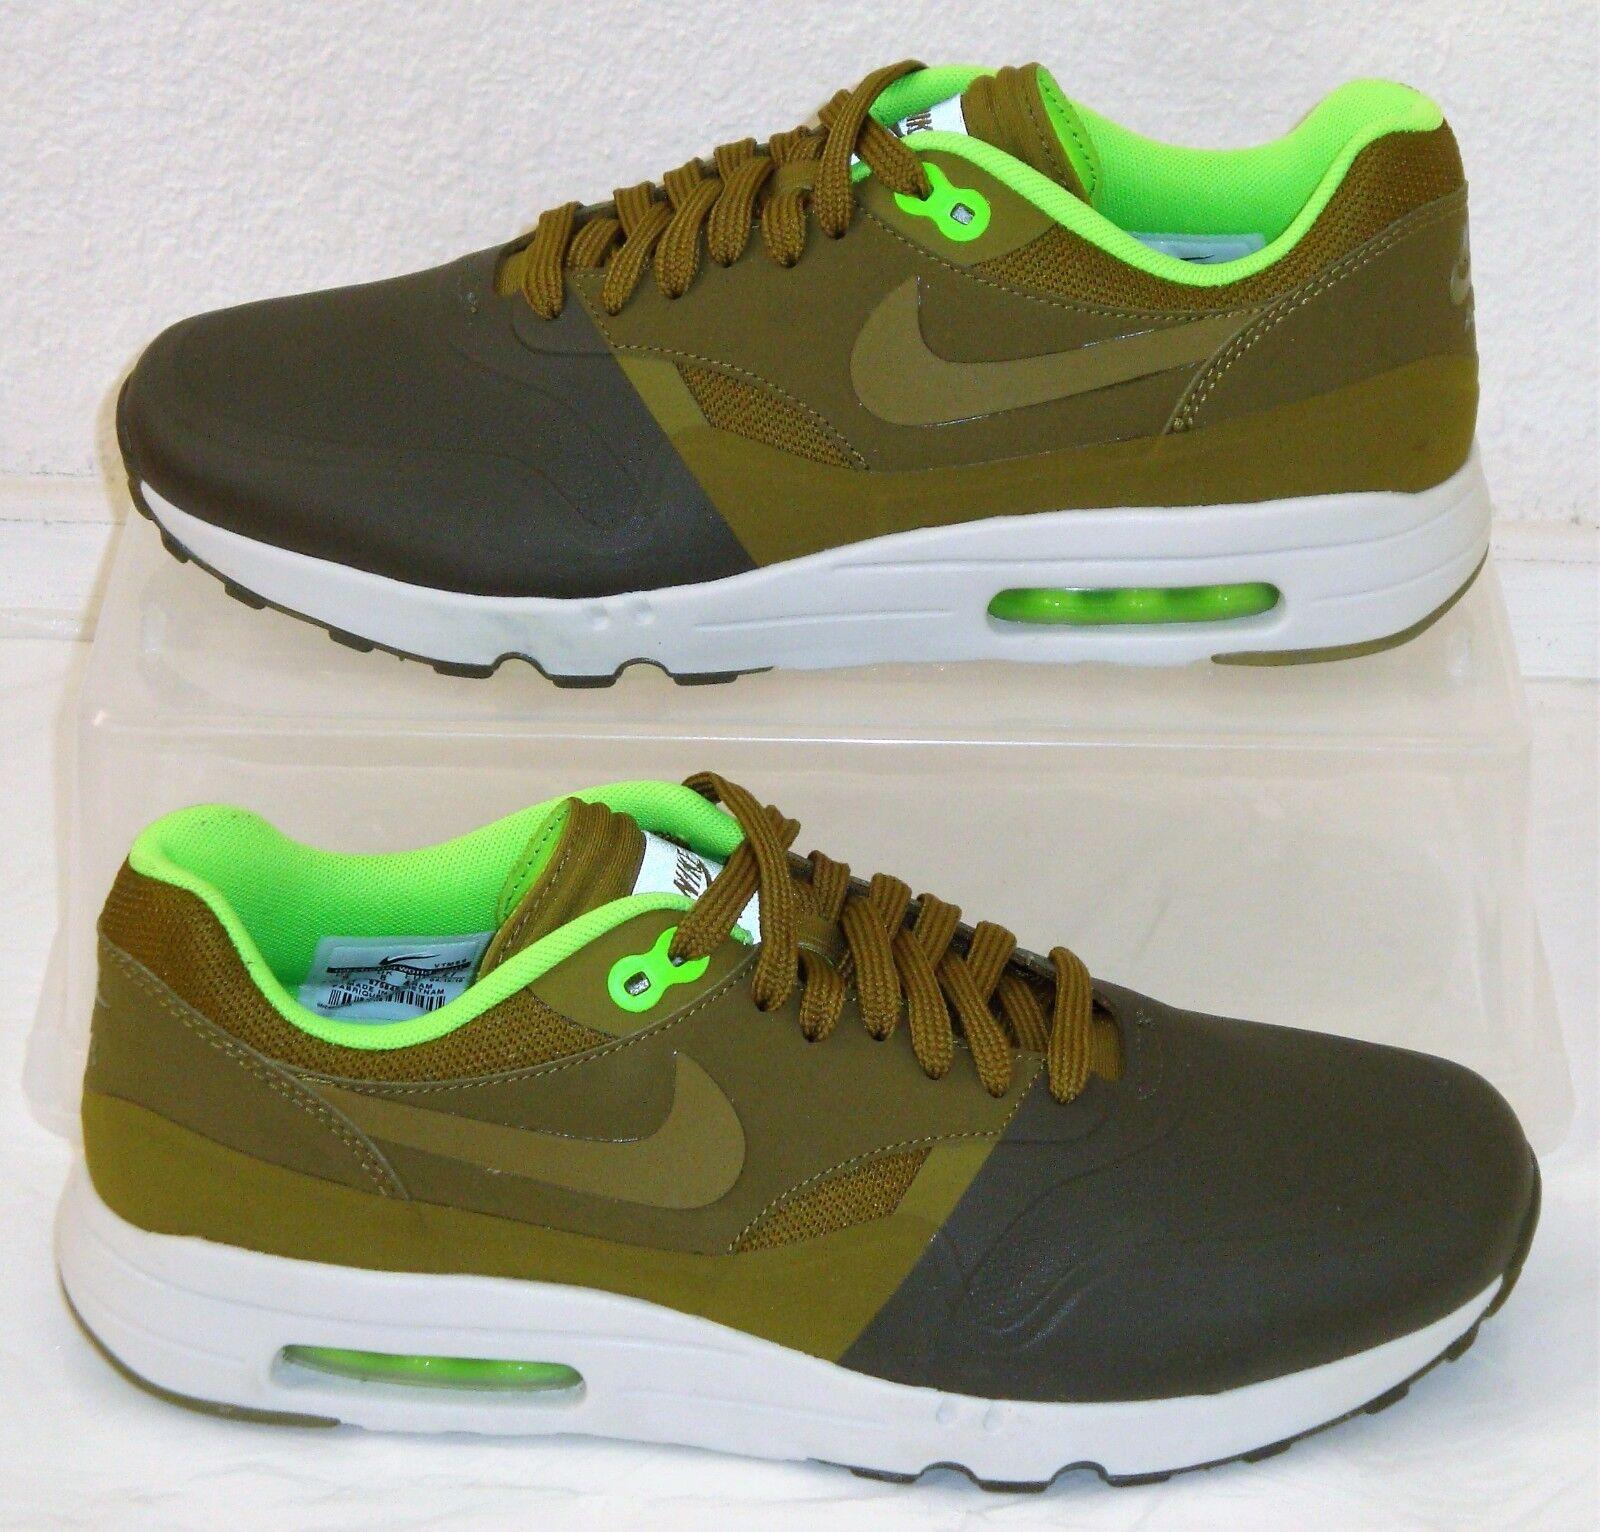 New Nike Air Max 1 Ultra SE 2.0 Khaki Green Mens US Size 9